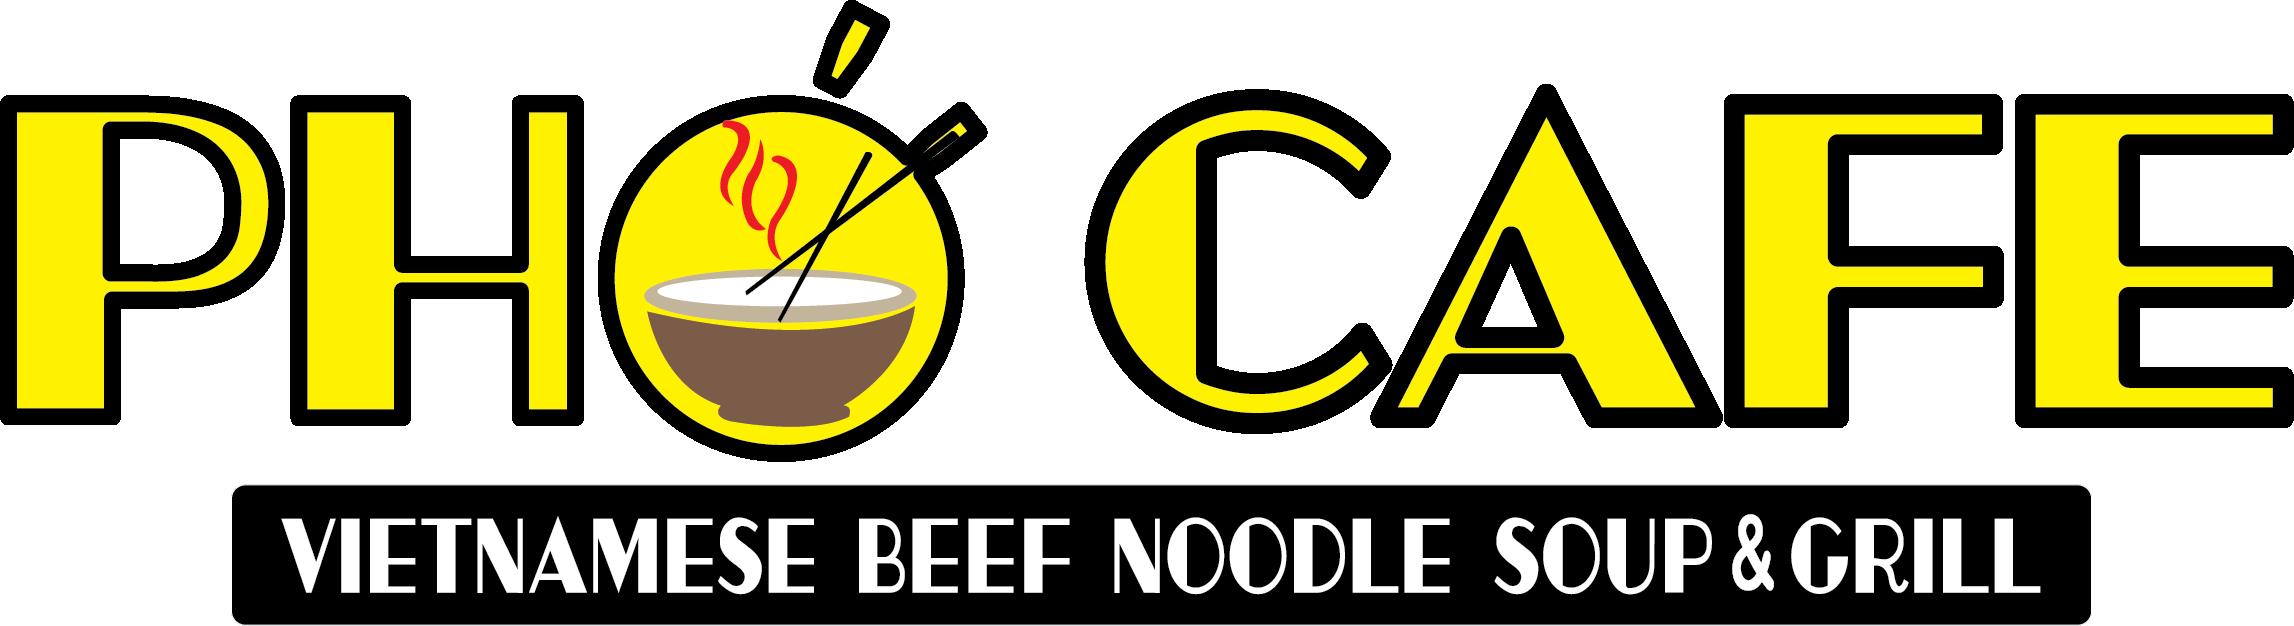 Pho Cafe Vietnamese  Restaurant Logo